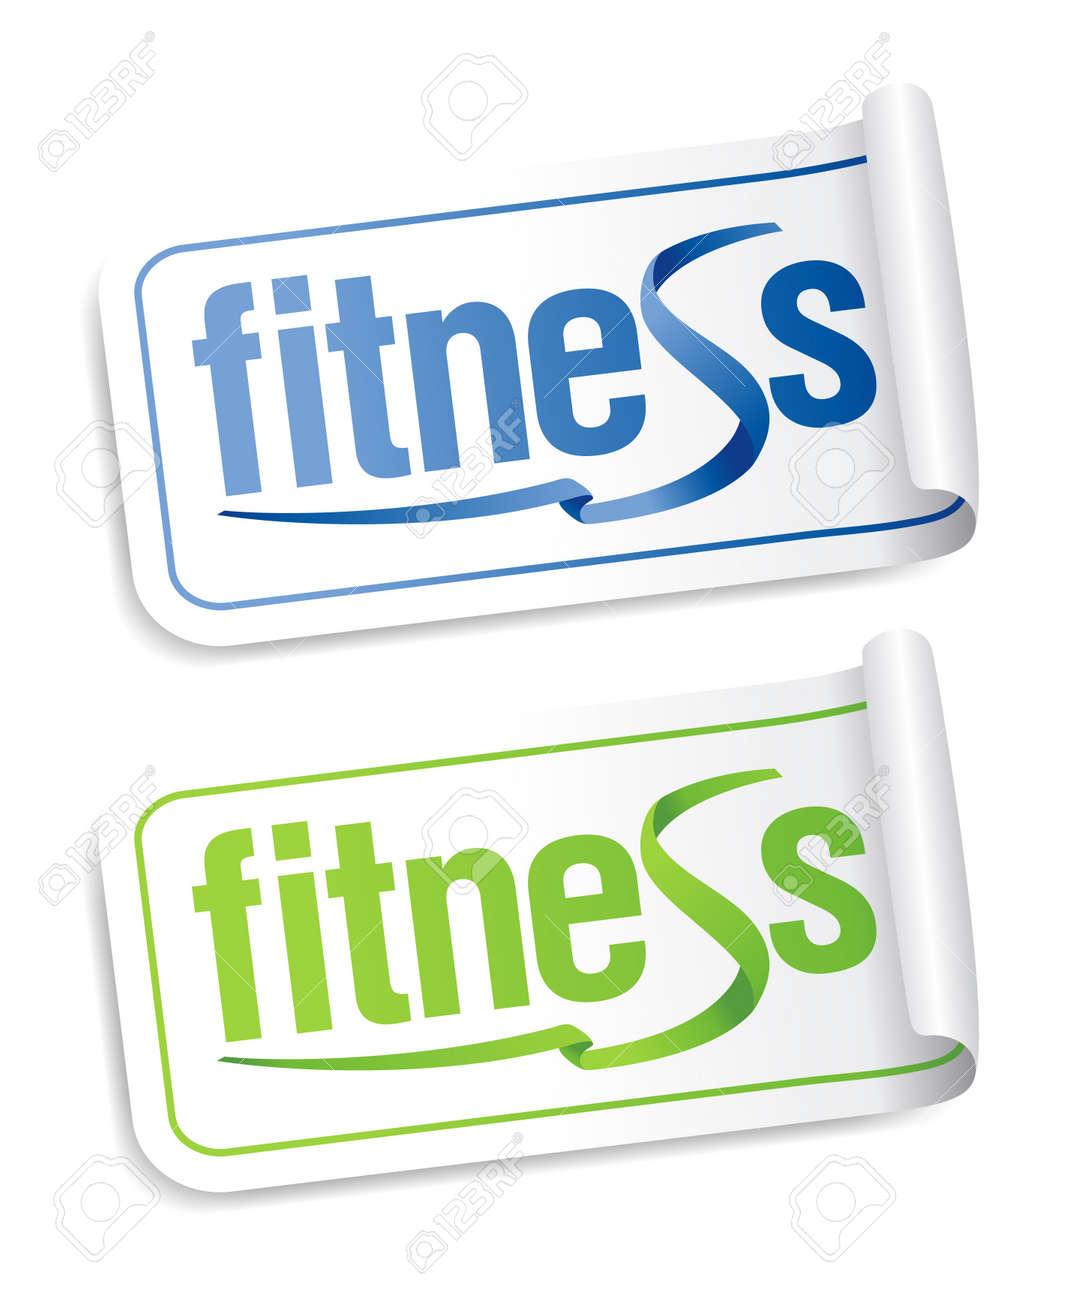 Fitness stickers set. Stock Vector - 10057840